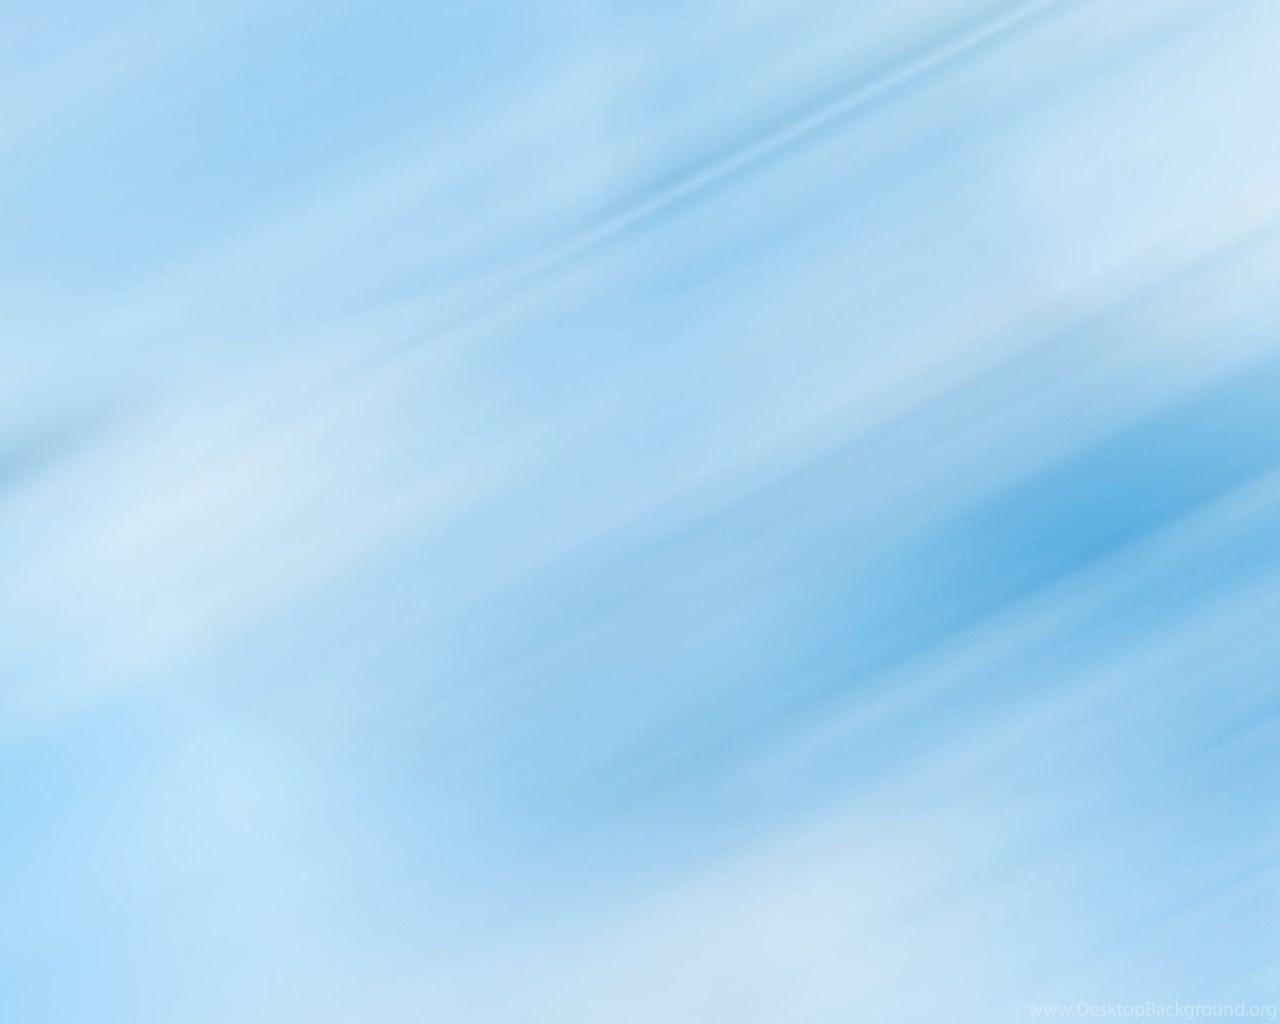 Light Blue Backgrounds Wallpaper. Desktop Background